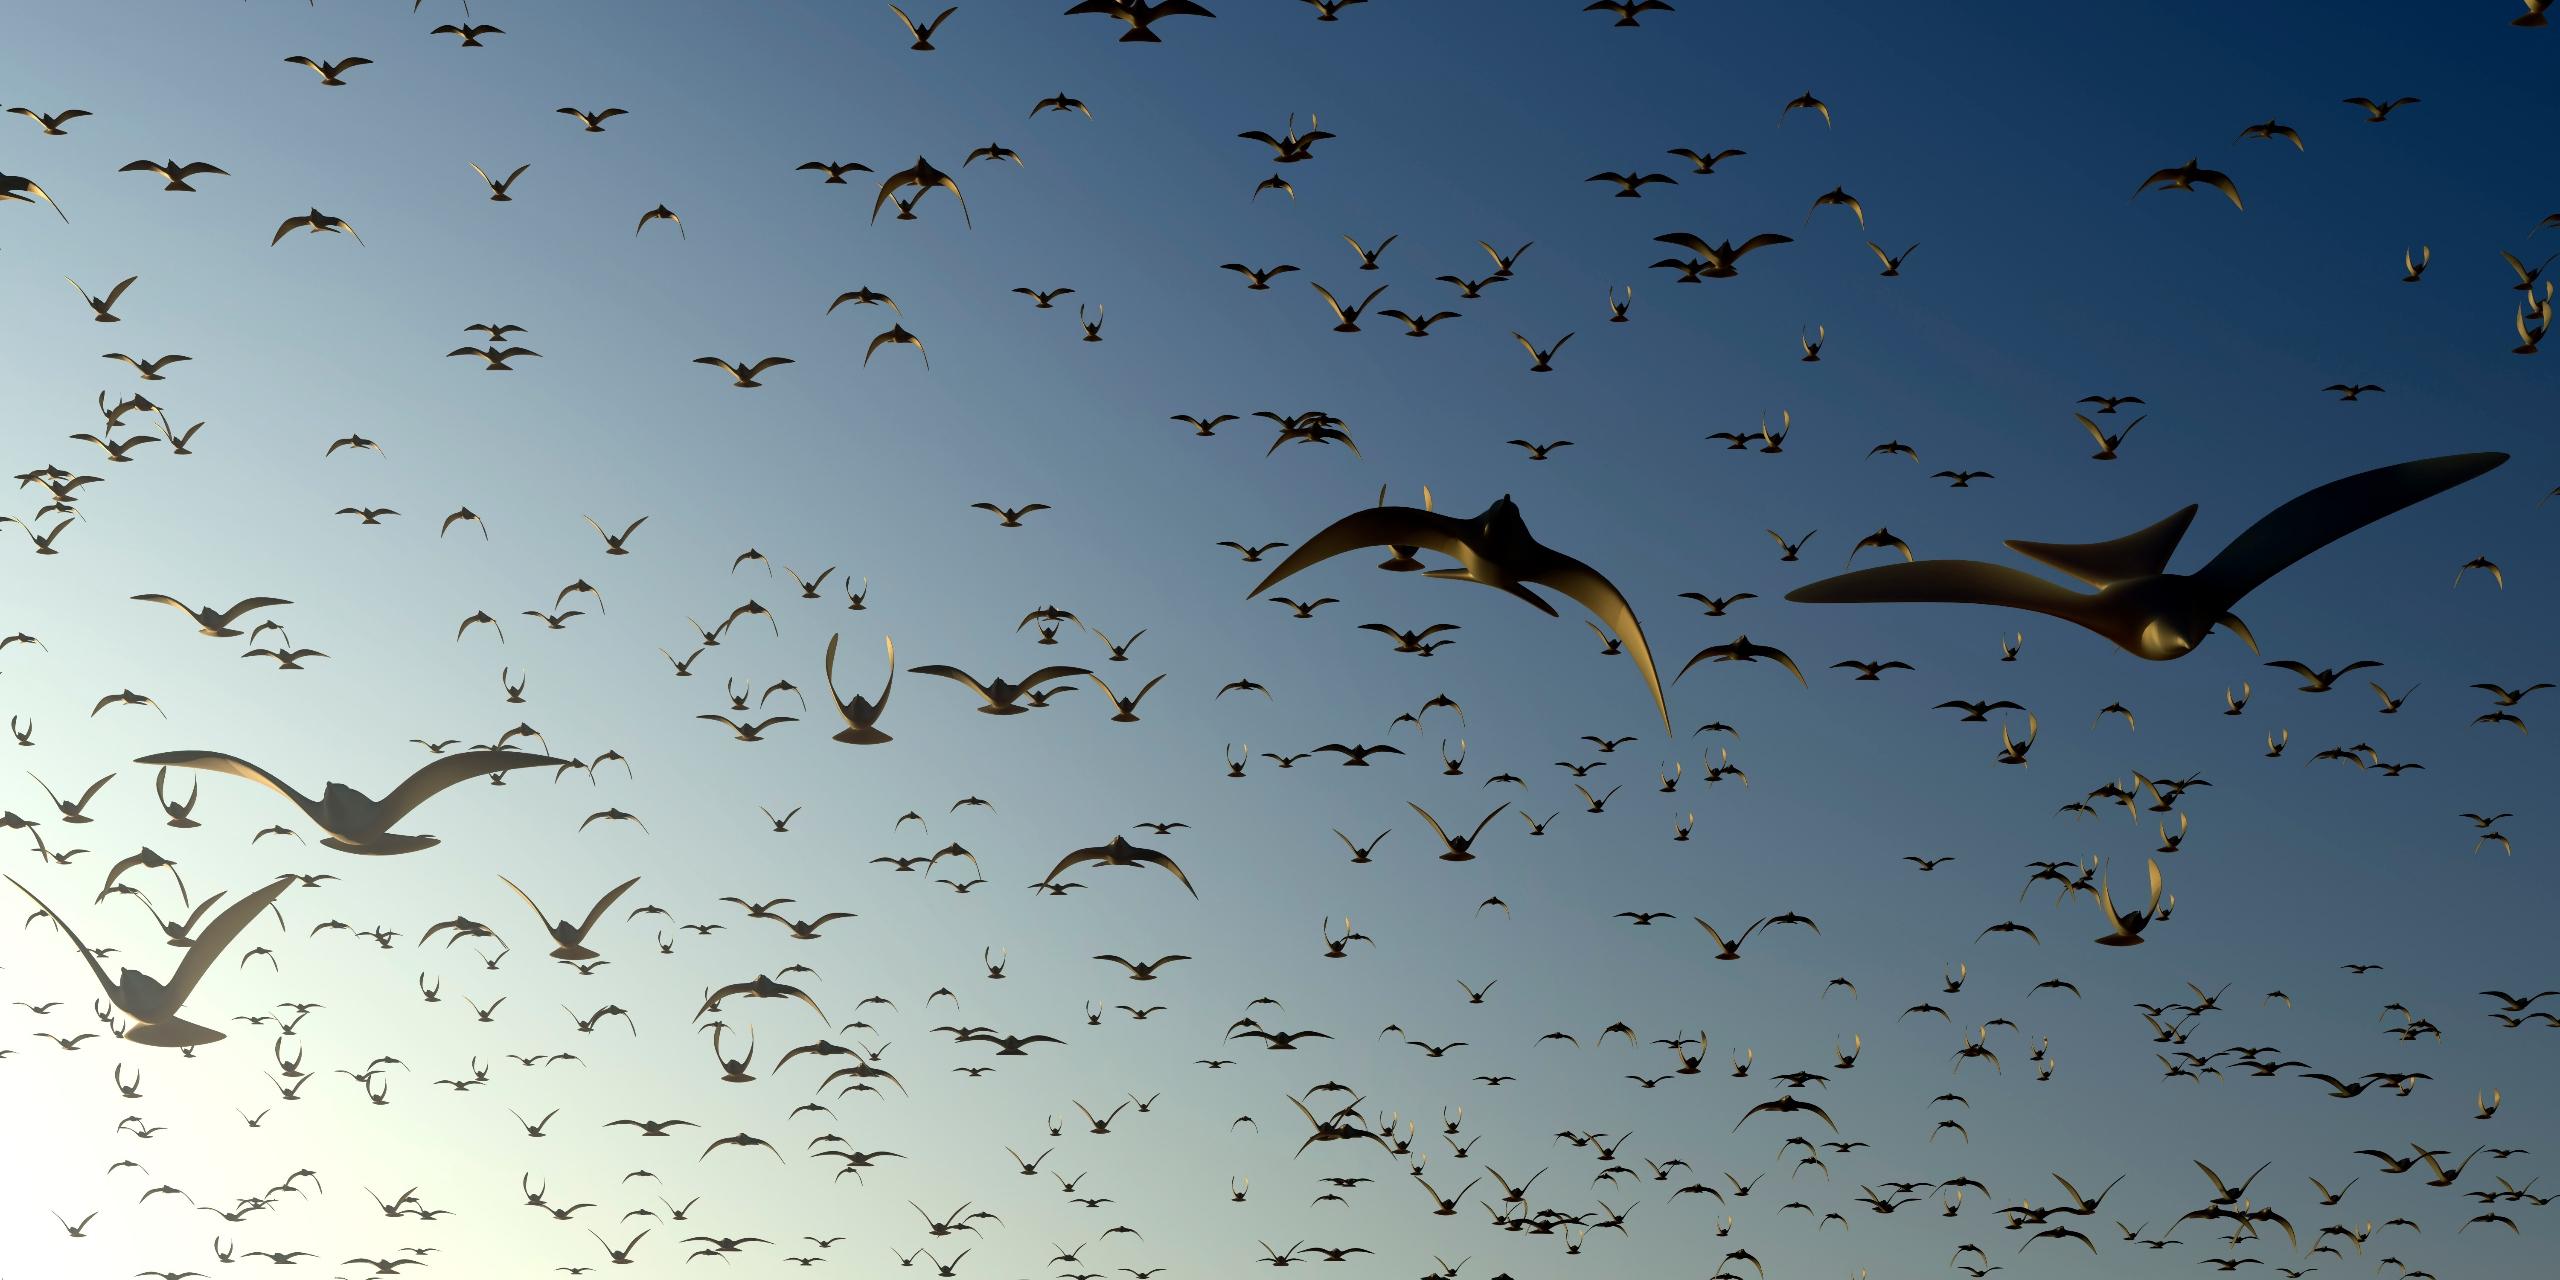 die Vögel kommen - matwe | ello